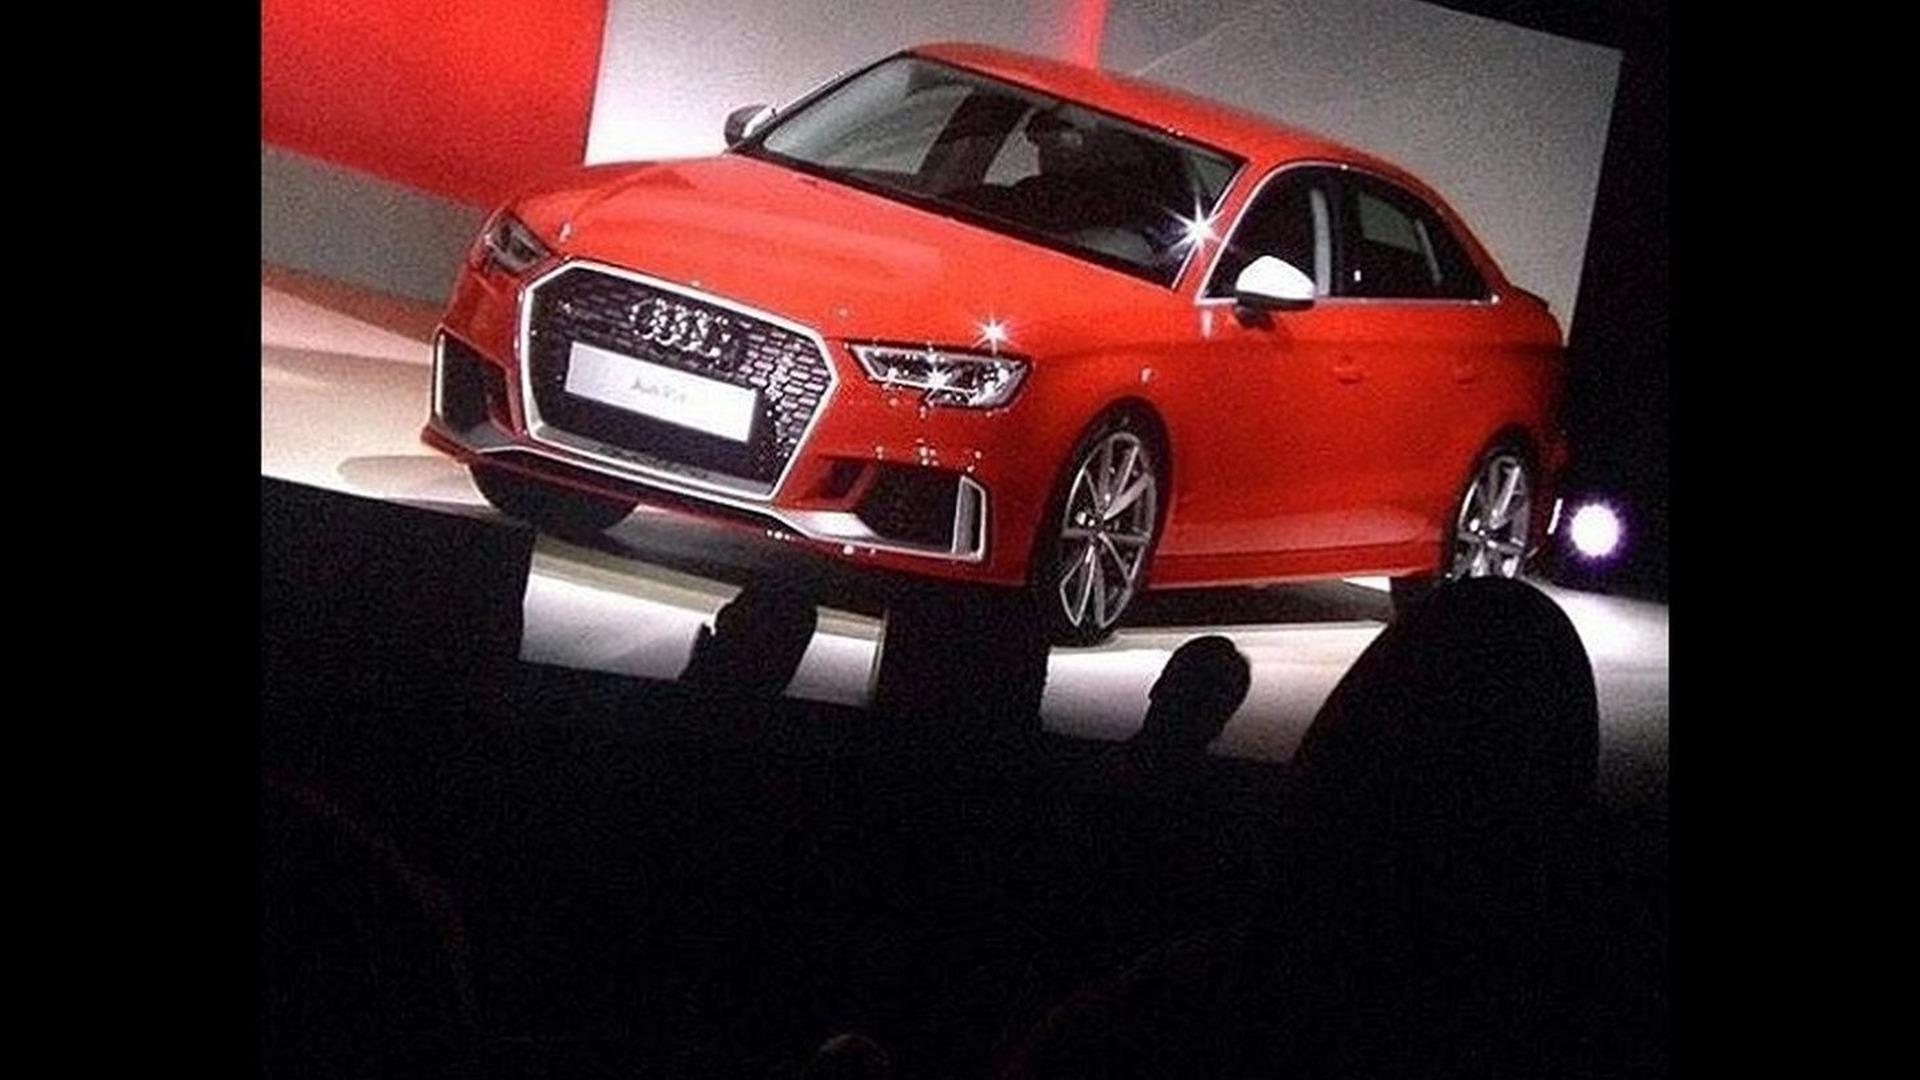 Is this the Audi RS3 Sedan or RS4 Sedan?